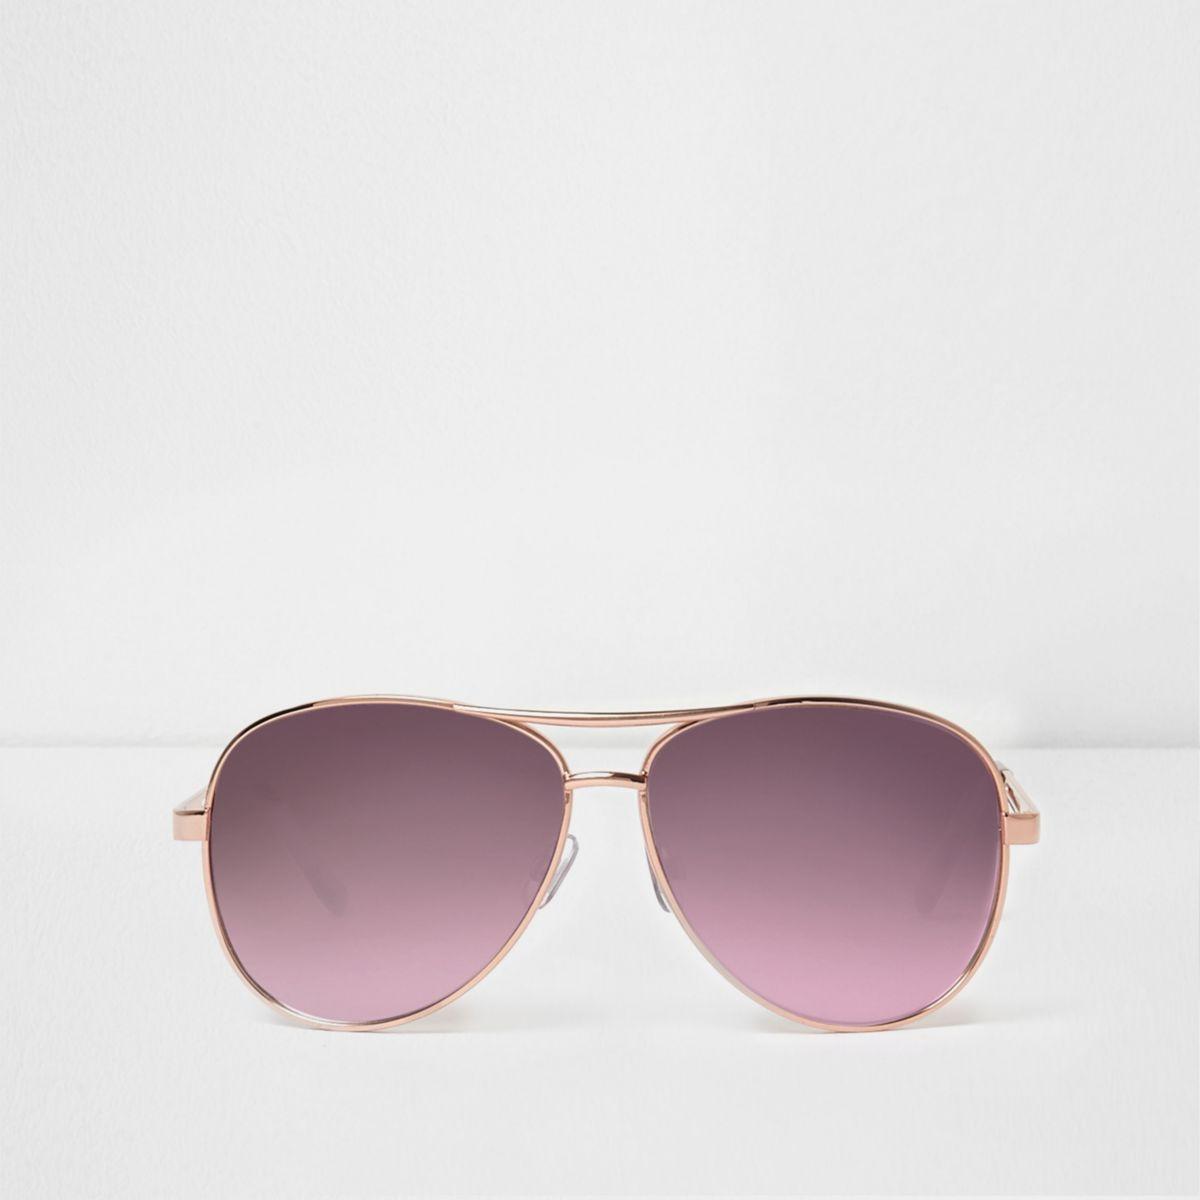 Lilac purple revo lens aviator sunglasses